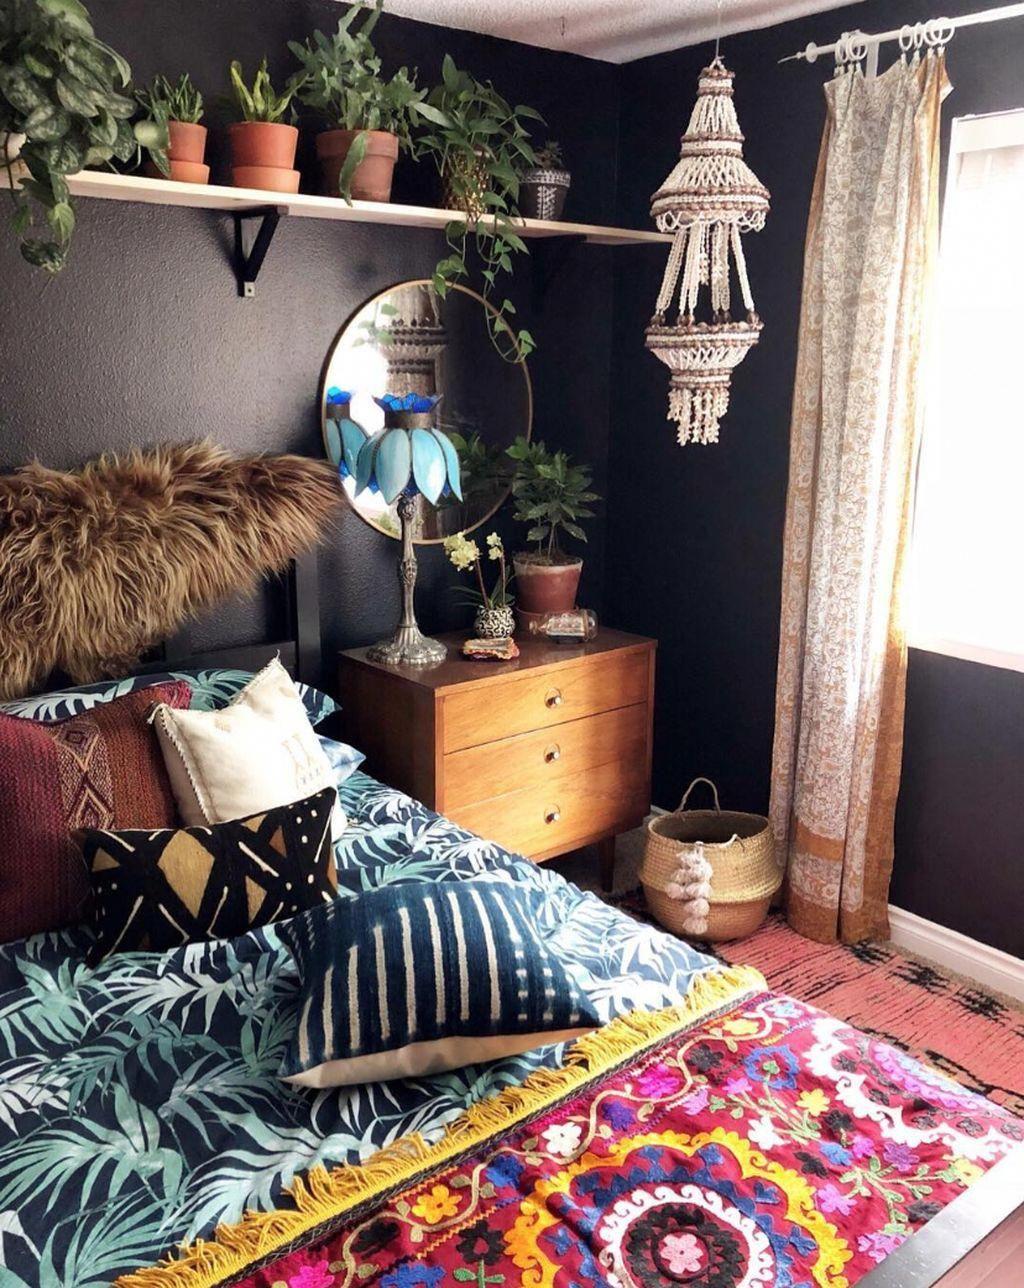 Diy Home Decor Luxurious Decorating Info To Uncover Now Bedroom Decor Cozy Diy Home Decor Bedroom Boho Bedroom Decor